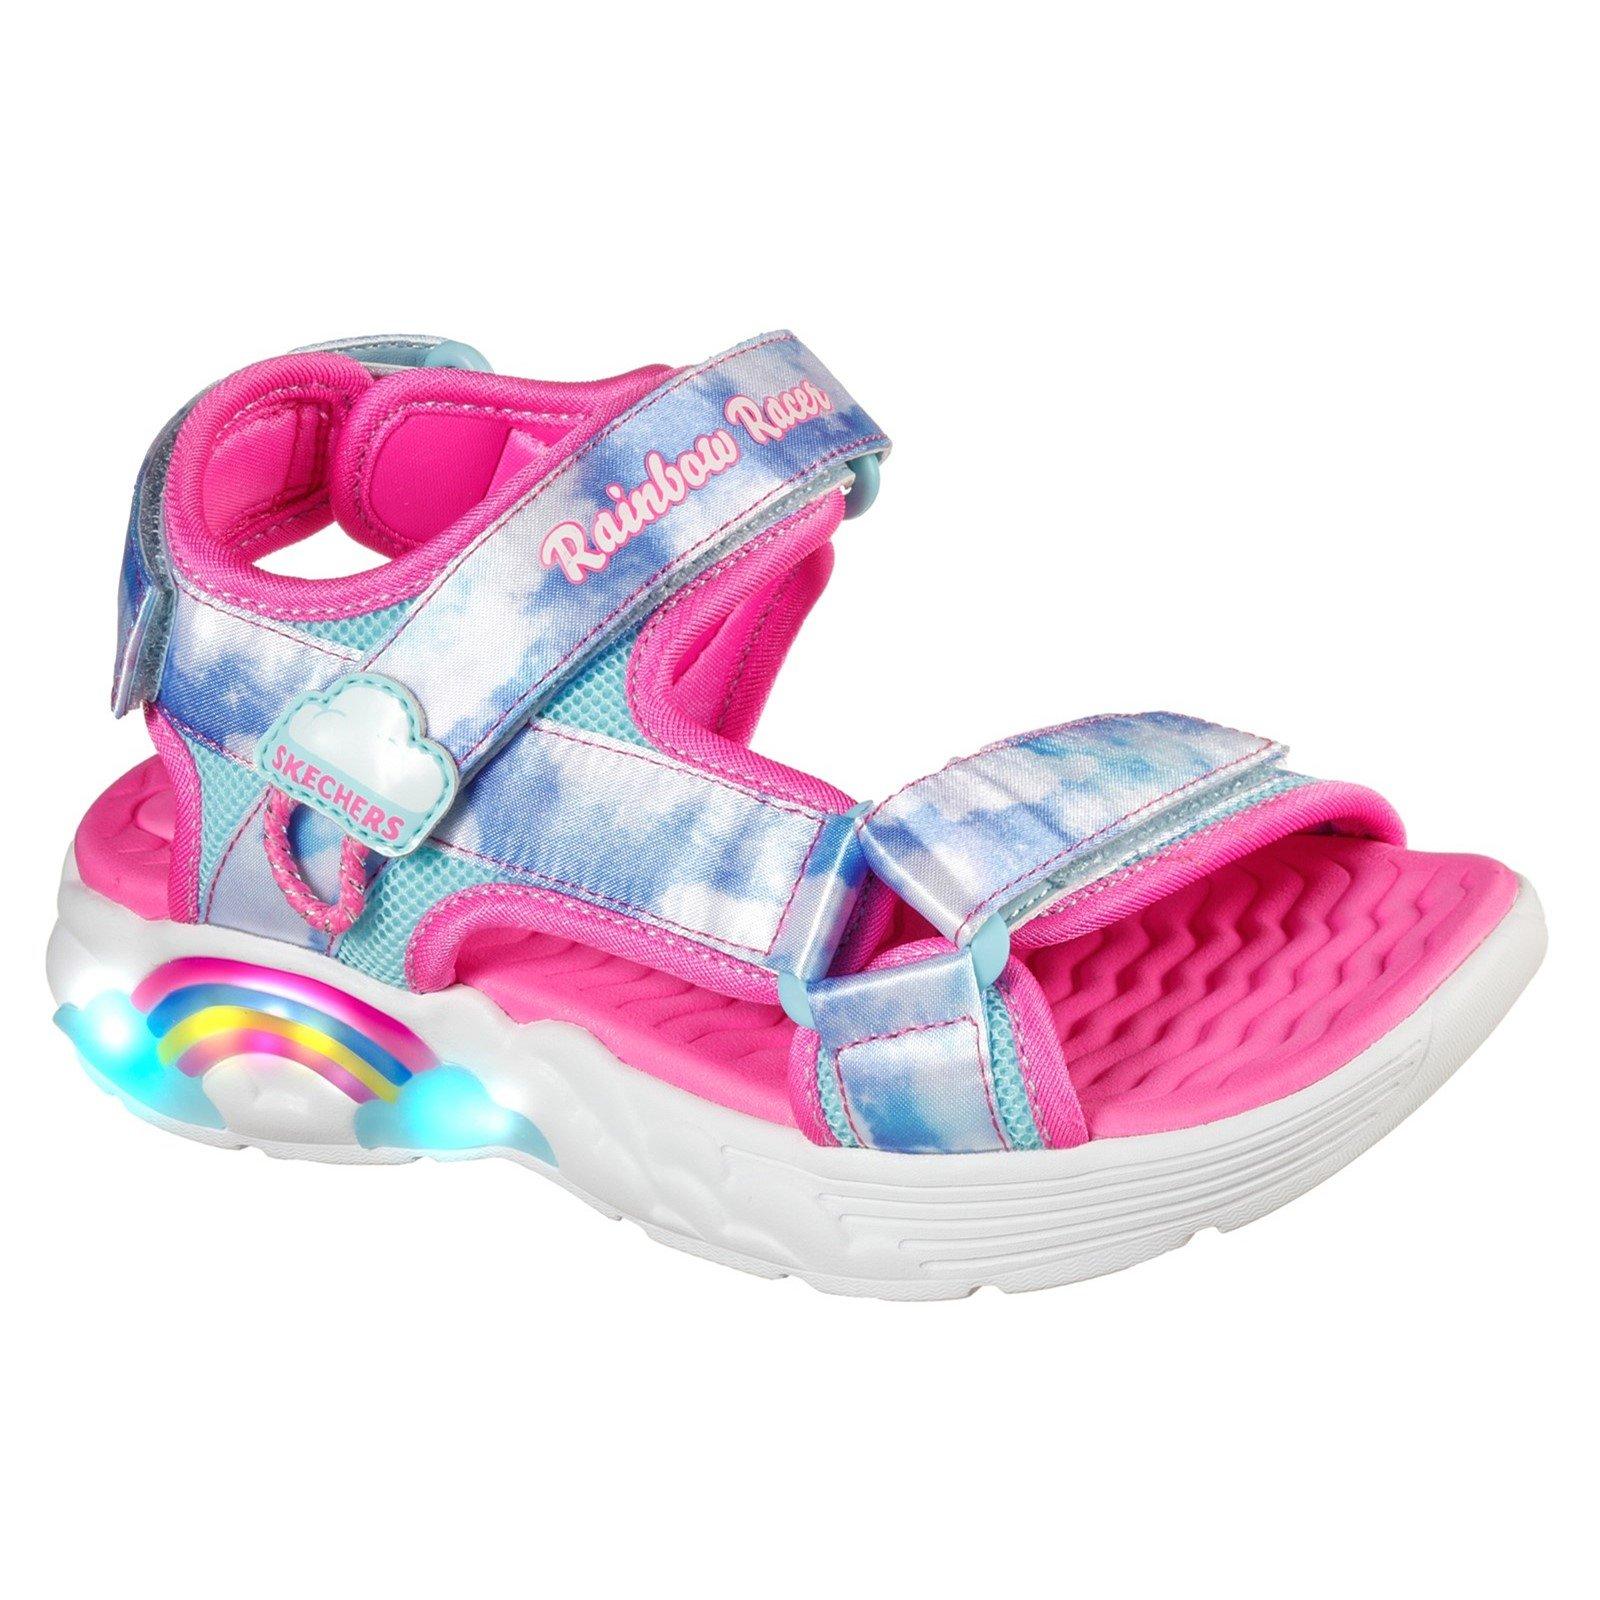 Skechers Unisex Rainbow Racer Summer Sky Beach Sandals Multicolor 32096 - Pink/Blue Textile 2